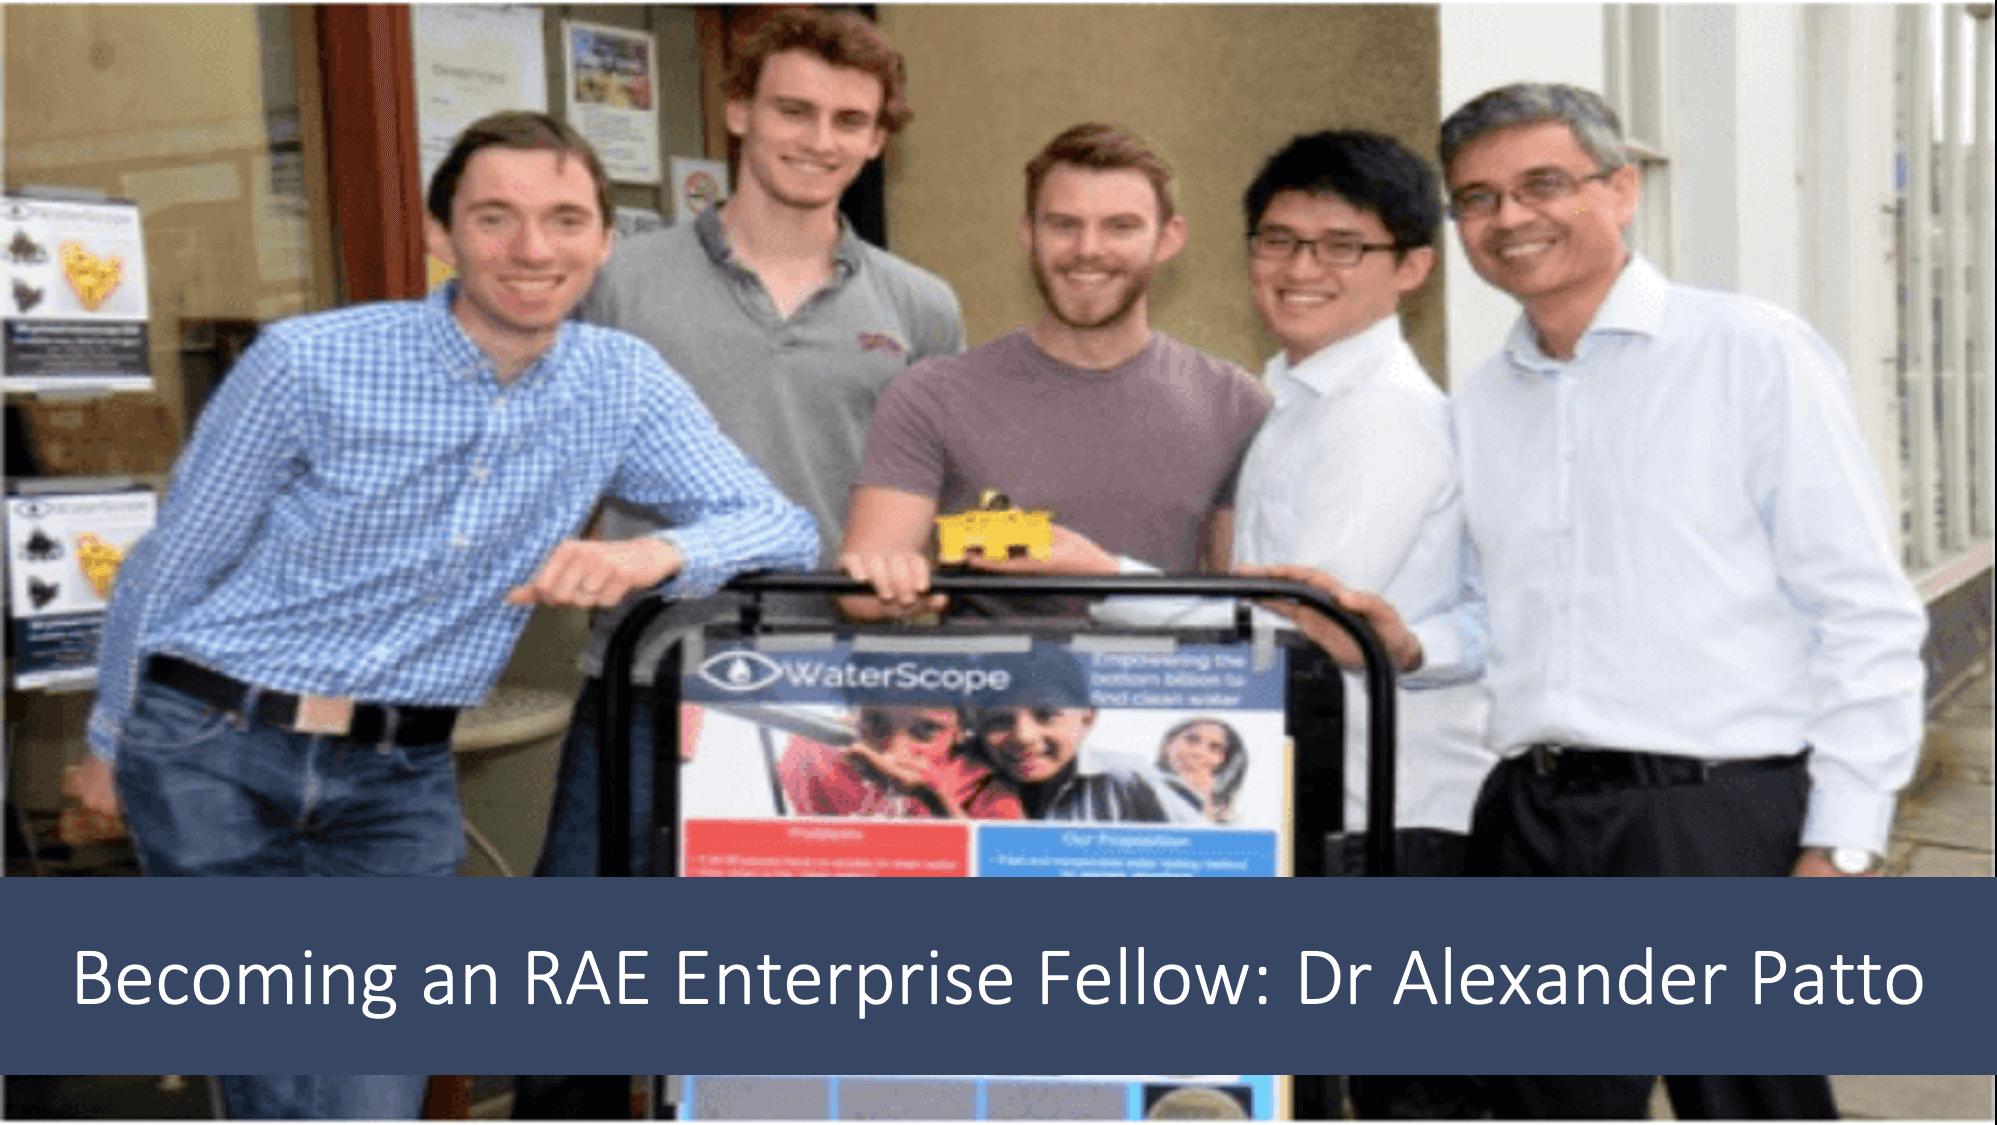 RAE Enterprise Fellow